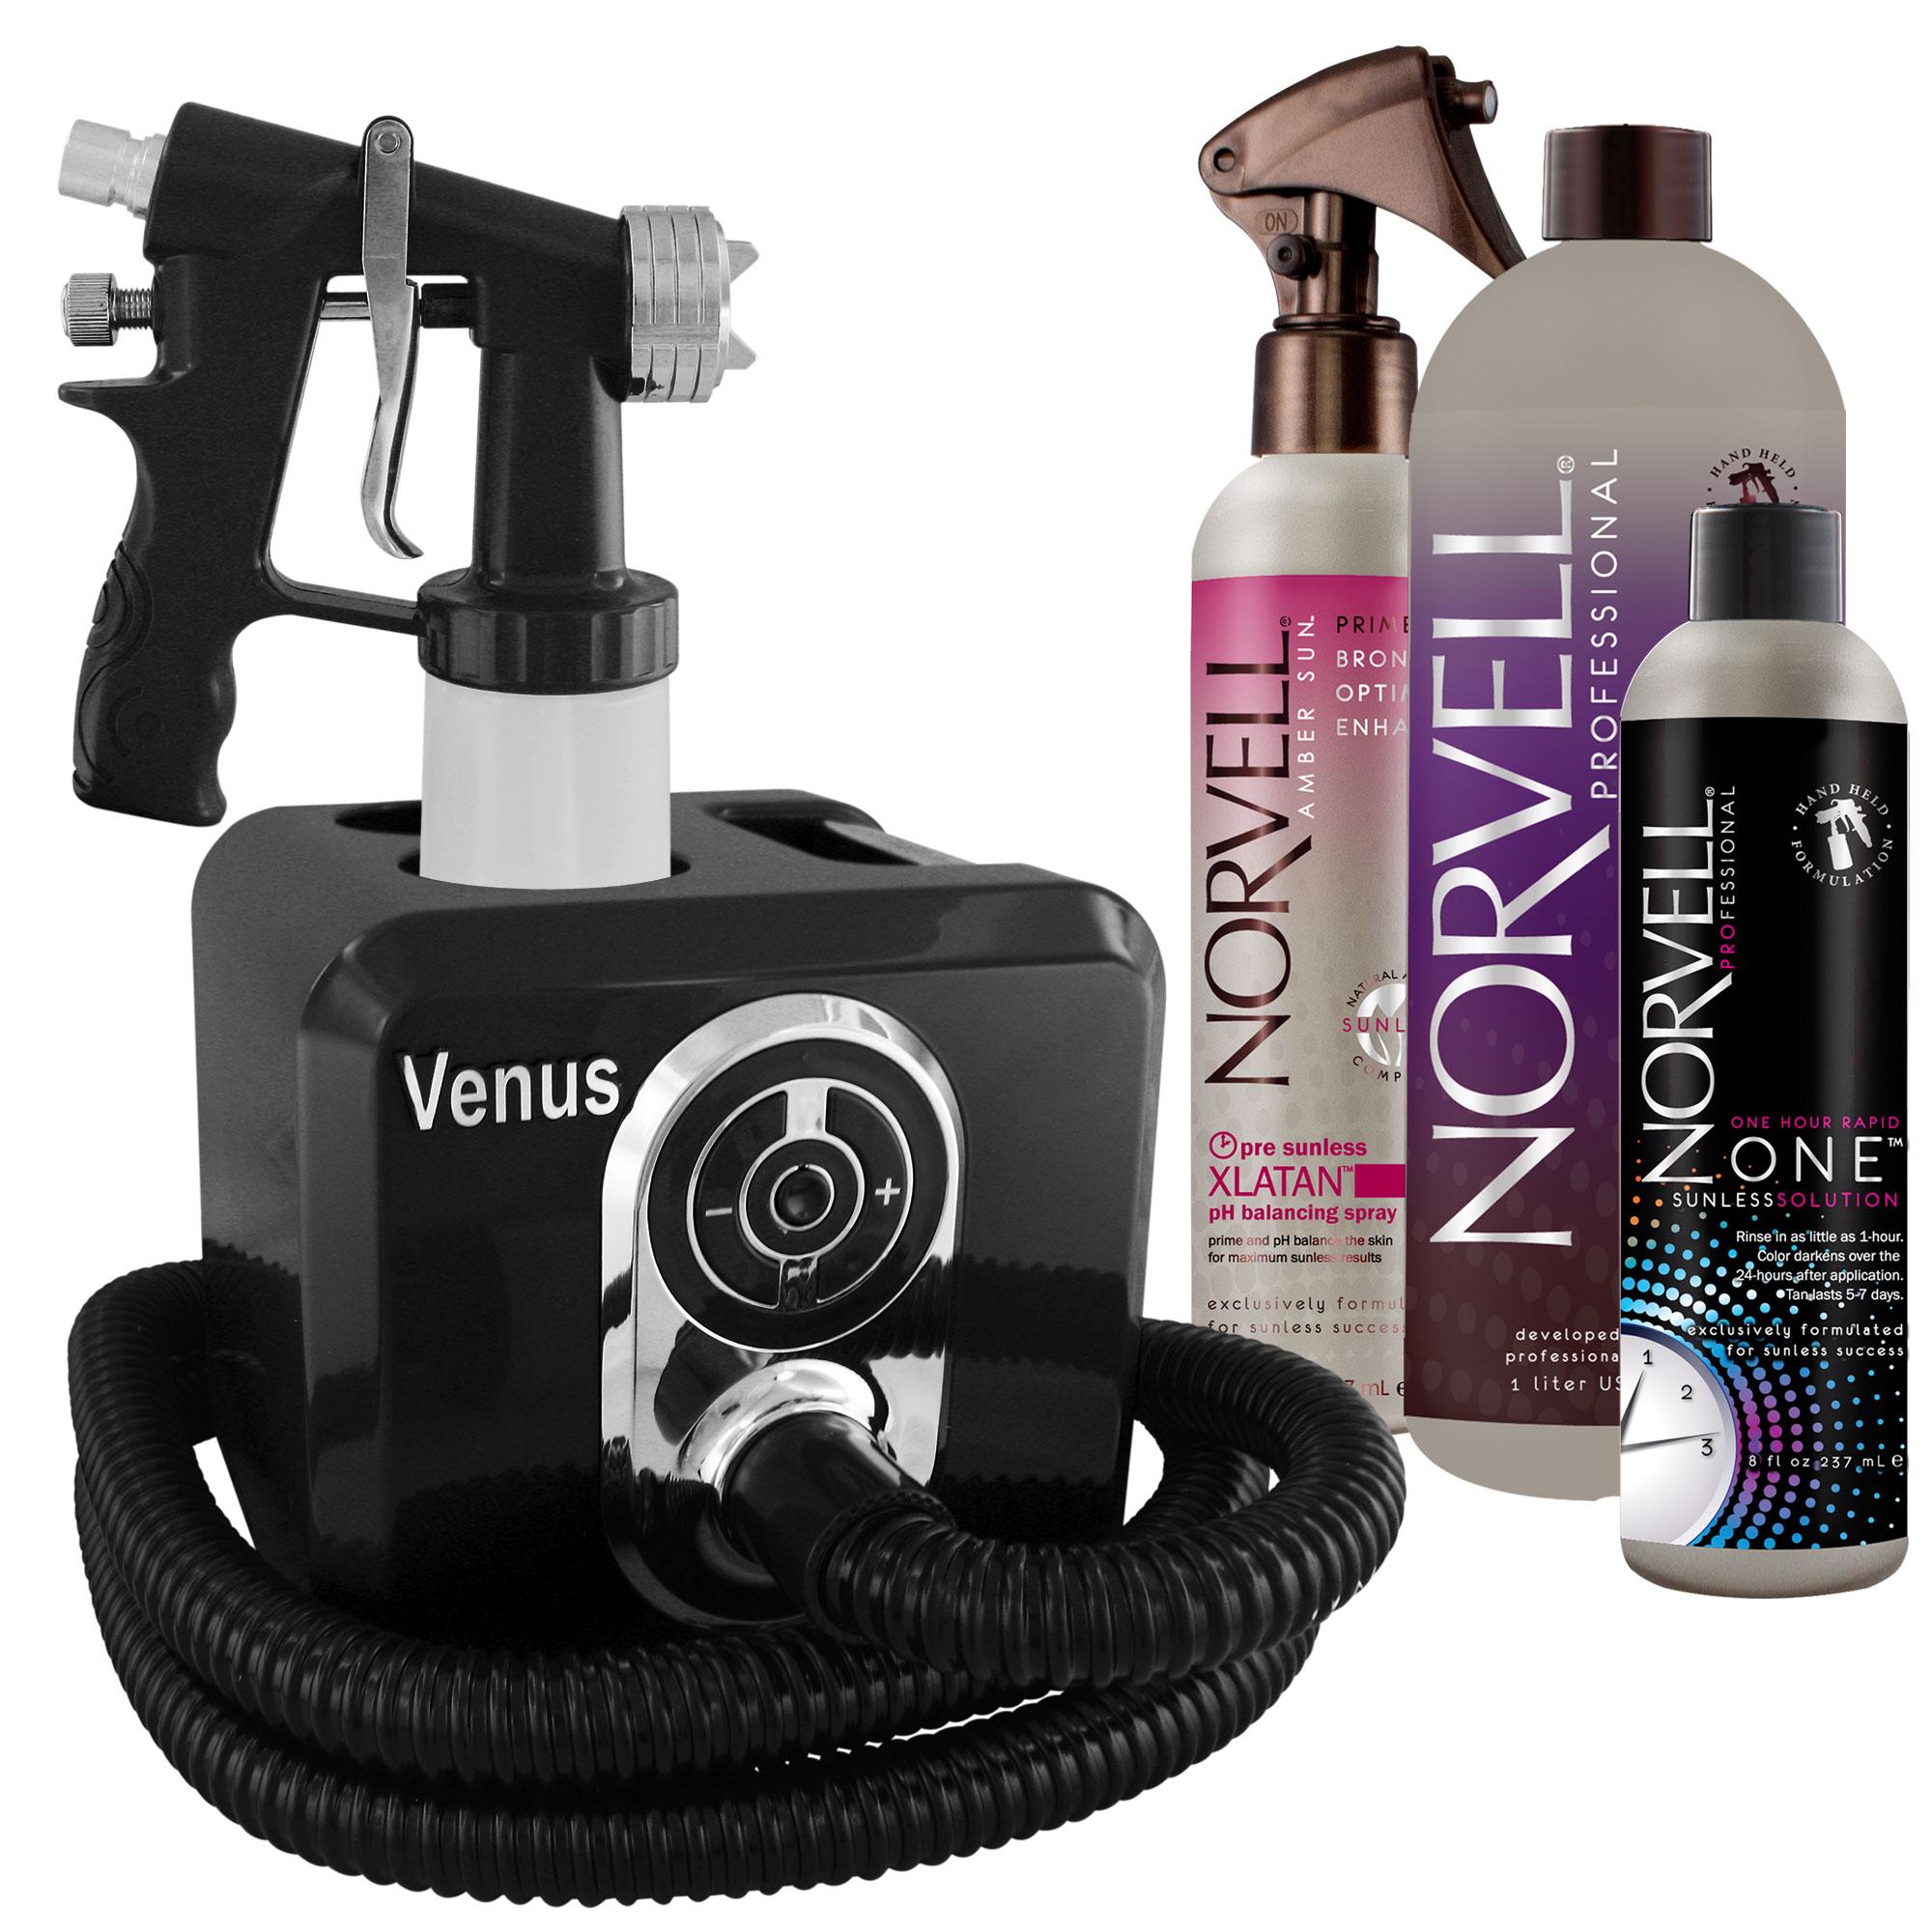 Venus Spray Tanning Machine Kit with Sunless Airbrush Tan...